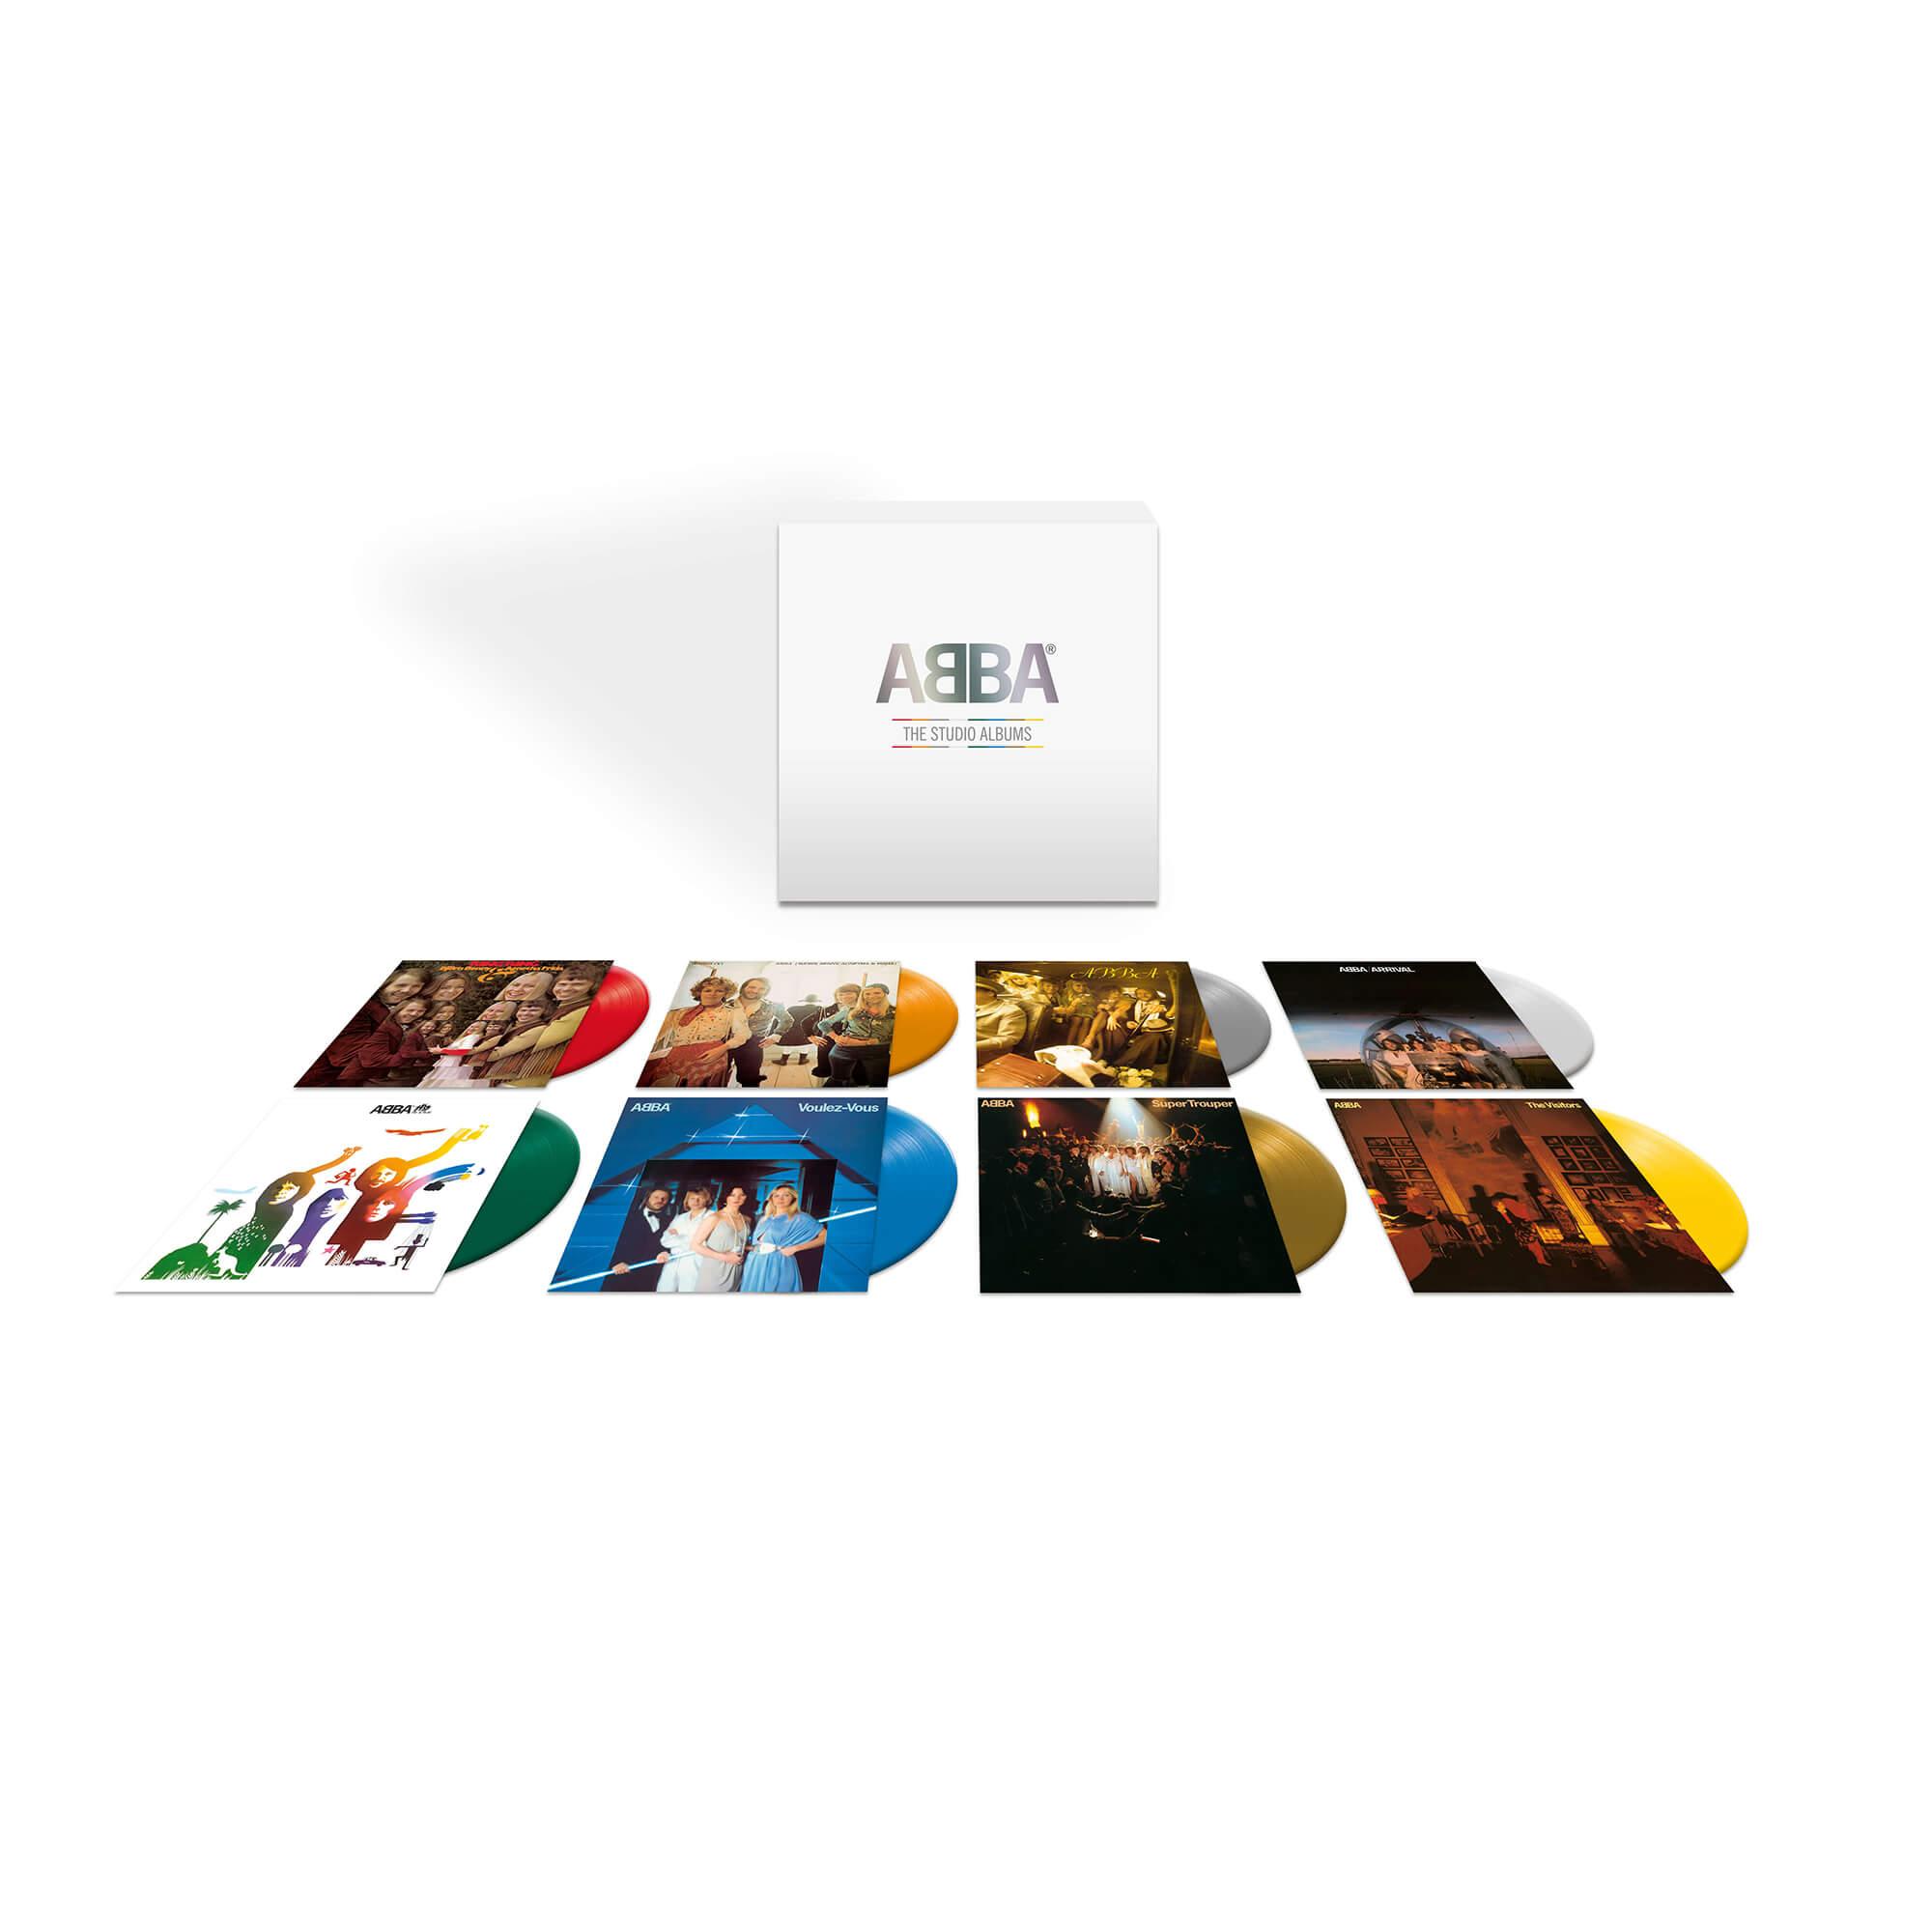 ABBA - The Studio Albums - ABBA - Musik - UNIVERSAL - 0602508378997 - 24/7-2020